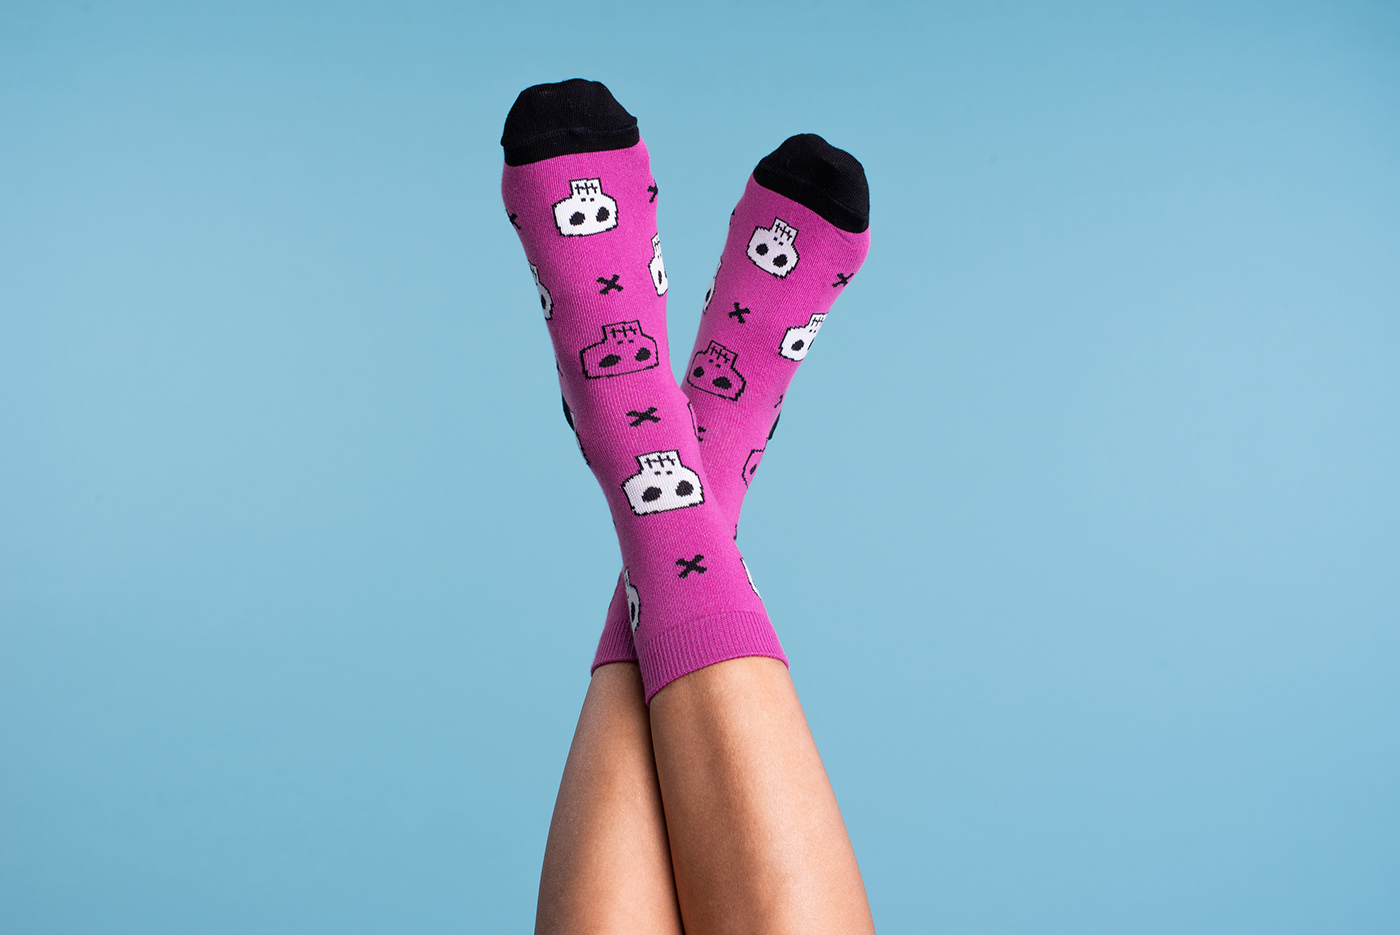 Fotografia photograghy photography socks socks